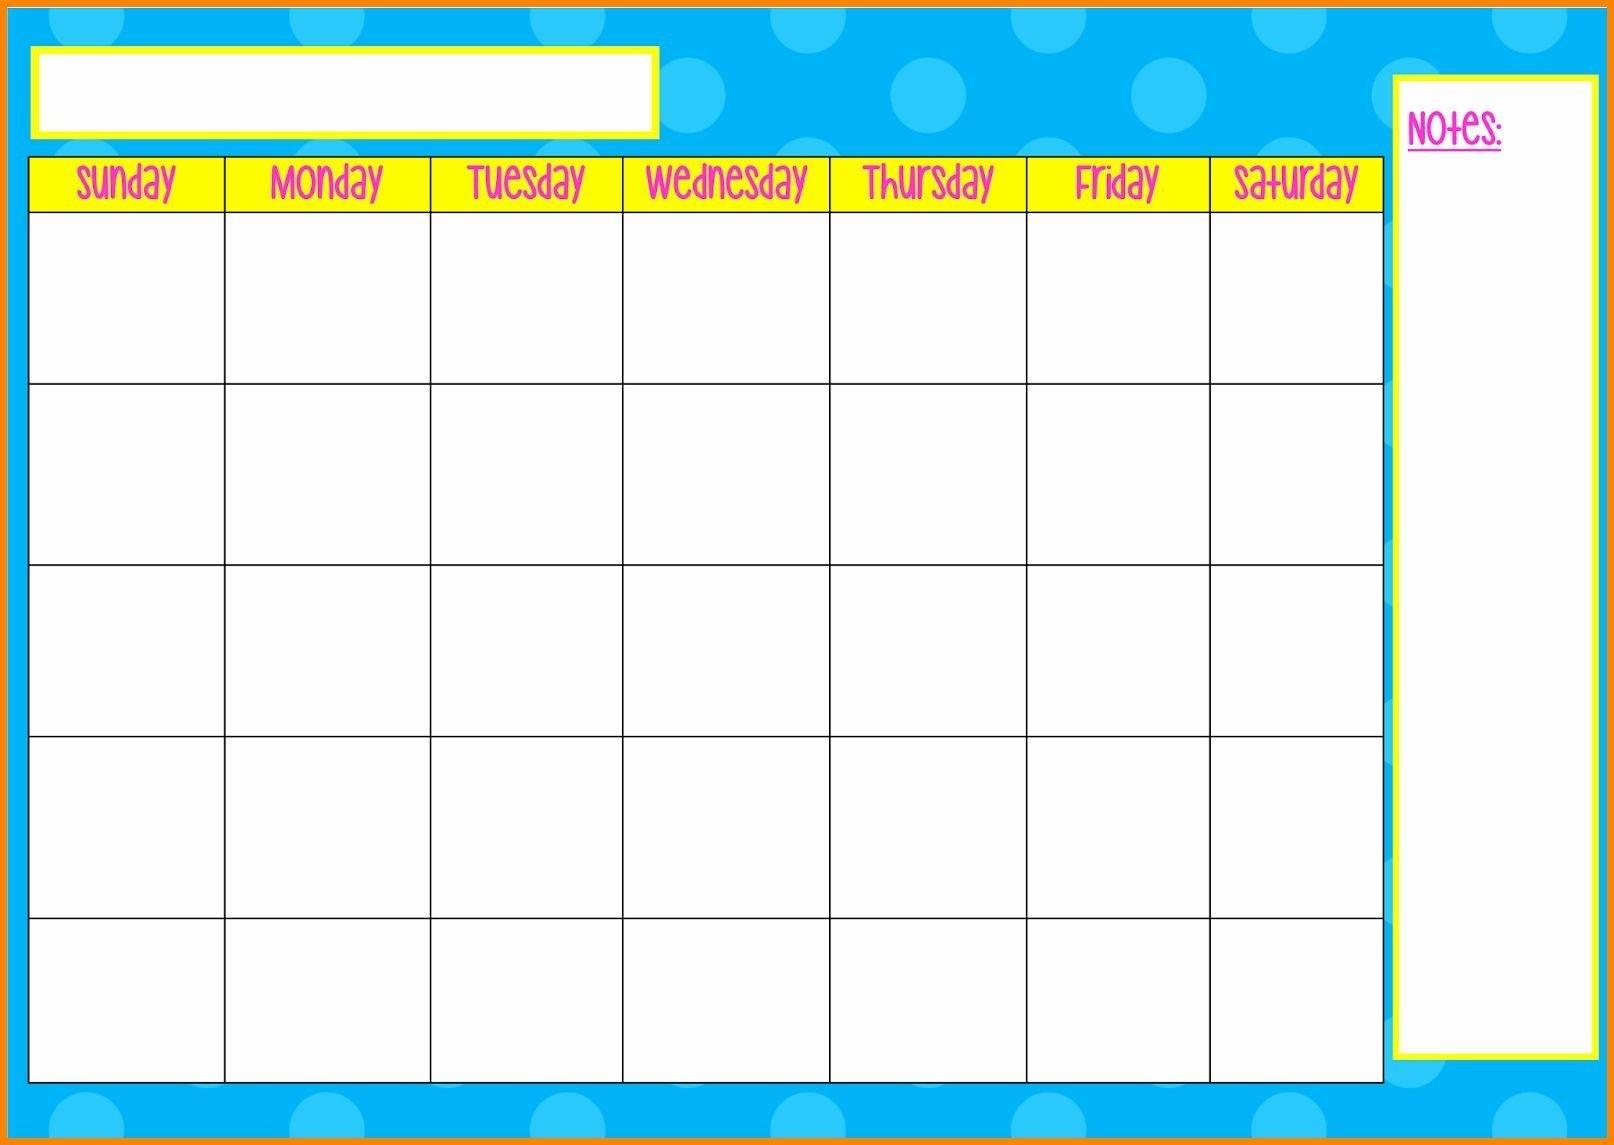 How To Monday Through Friday Calendar Word | Get Your Sample Calendar Monday To Friday